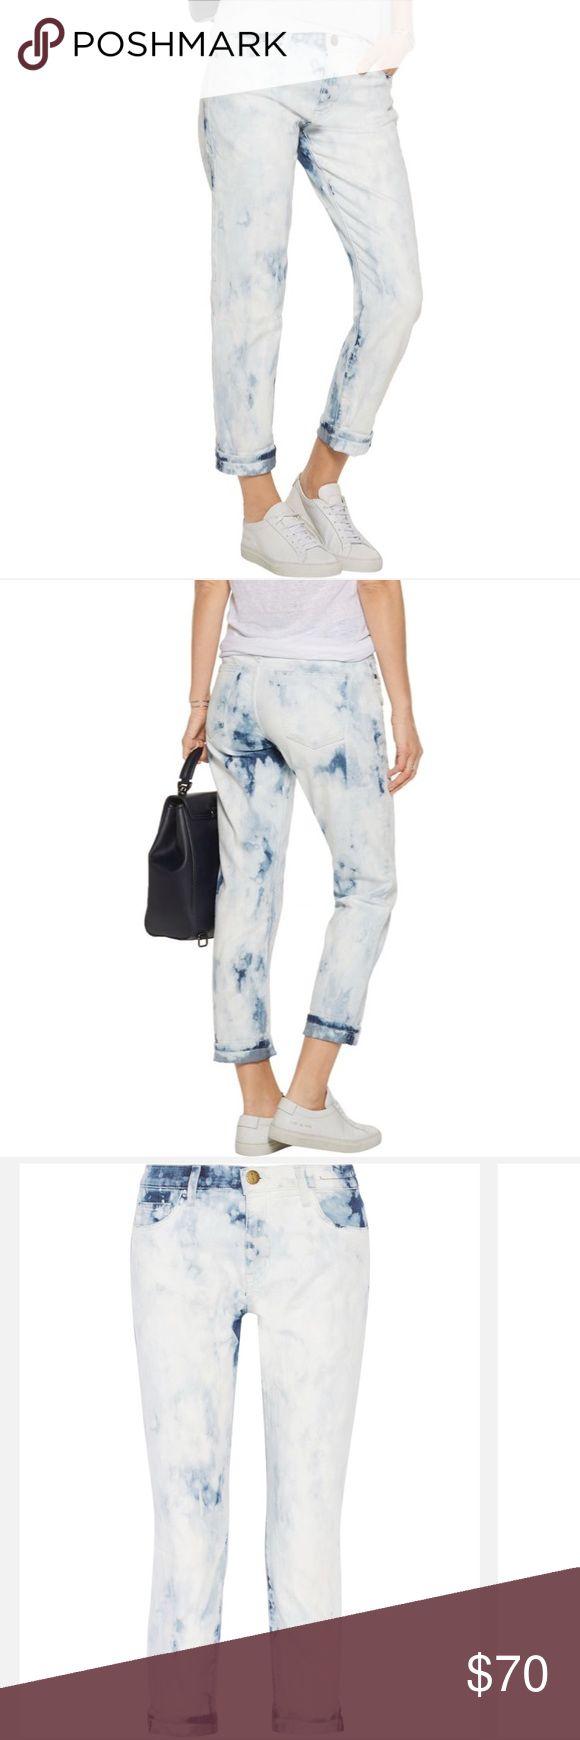 Current/Elliott Fling acid Tie-dye Mid-rise Jeans Current/Elliott Women's Blue The Fling Tie-dye Mid-rise Slim Boyfriend Jeans - excellent condition, only worn max 3 times! Current/Elliott Jeans Boyfriend